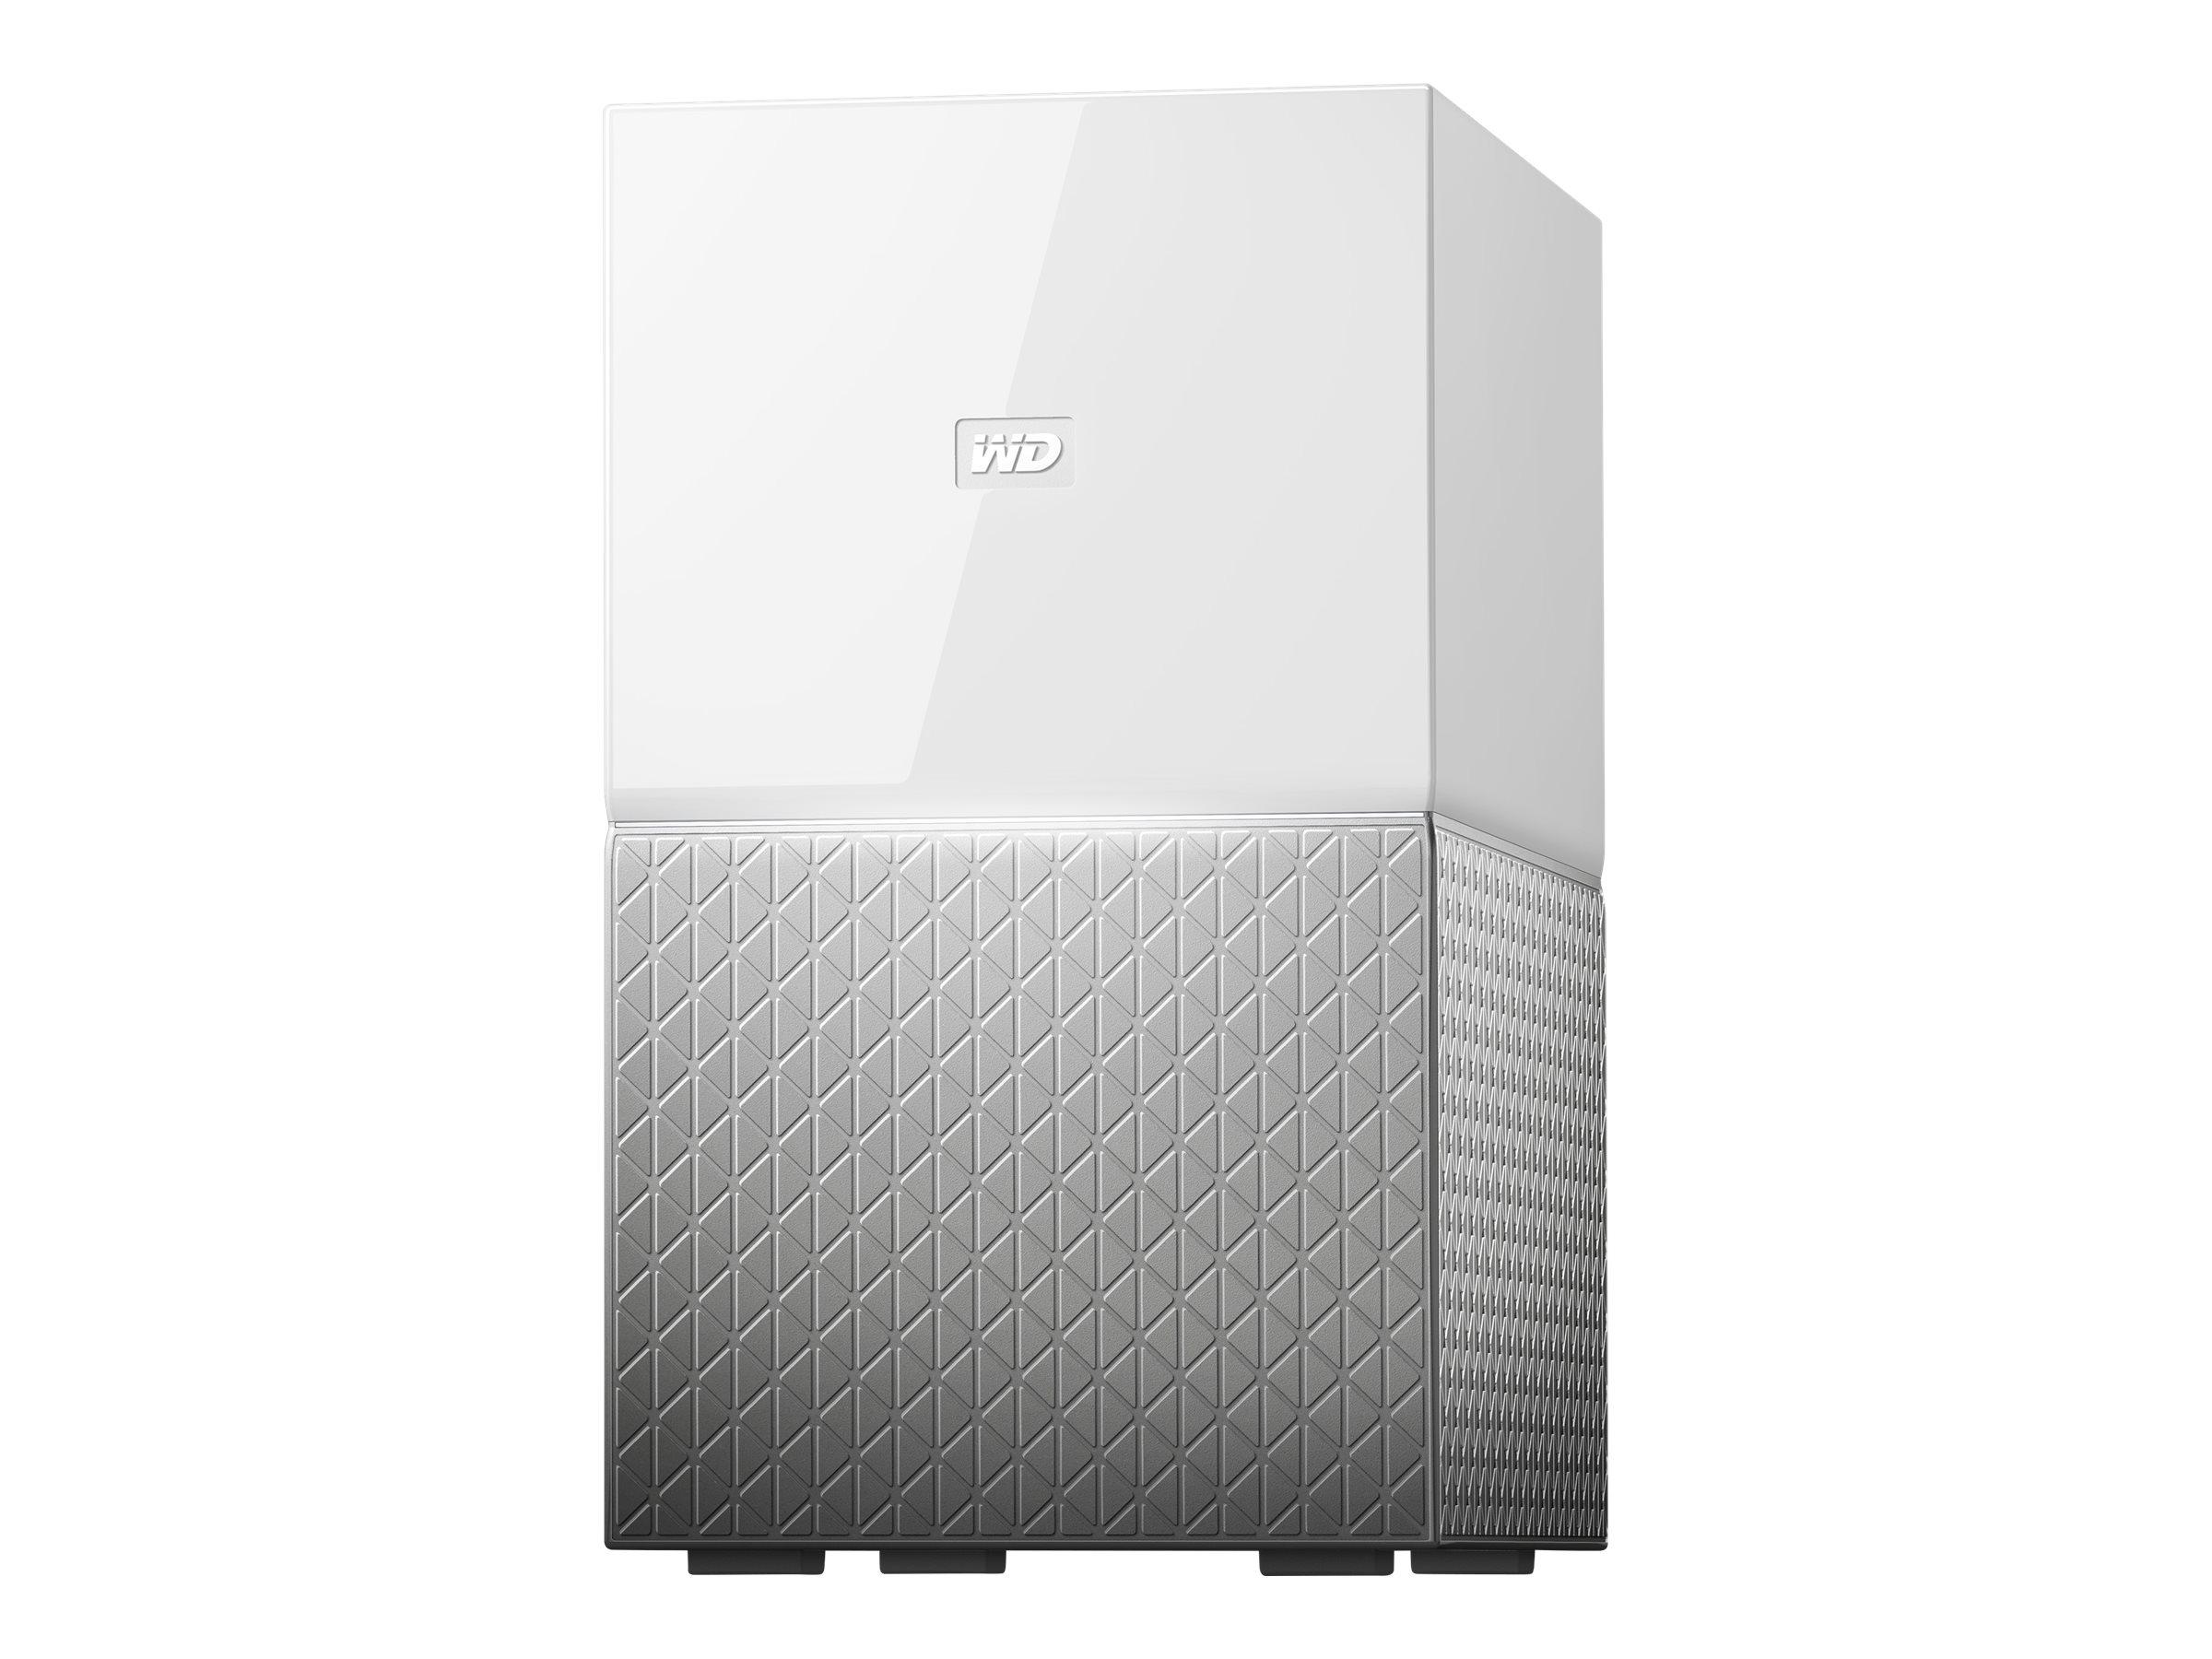 WD My Cloud Home Duo WDBMUT0060JWT - Gerät für persönlichen Cloudspeicher - 6 TB - HDD 3 TB x 2 - RAID 1, JBOD - Gigabit Etherne